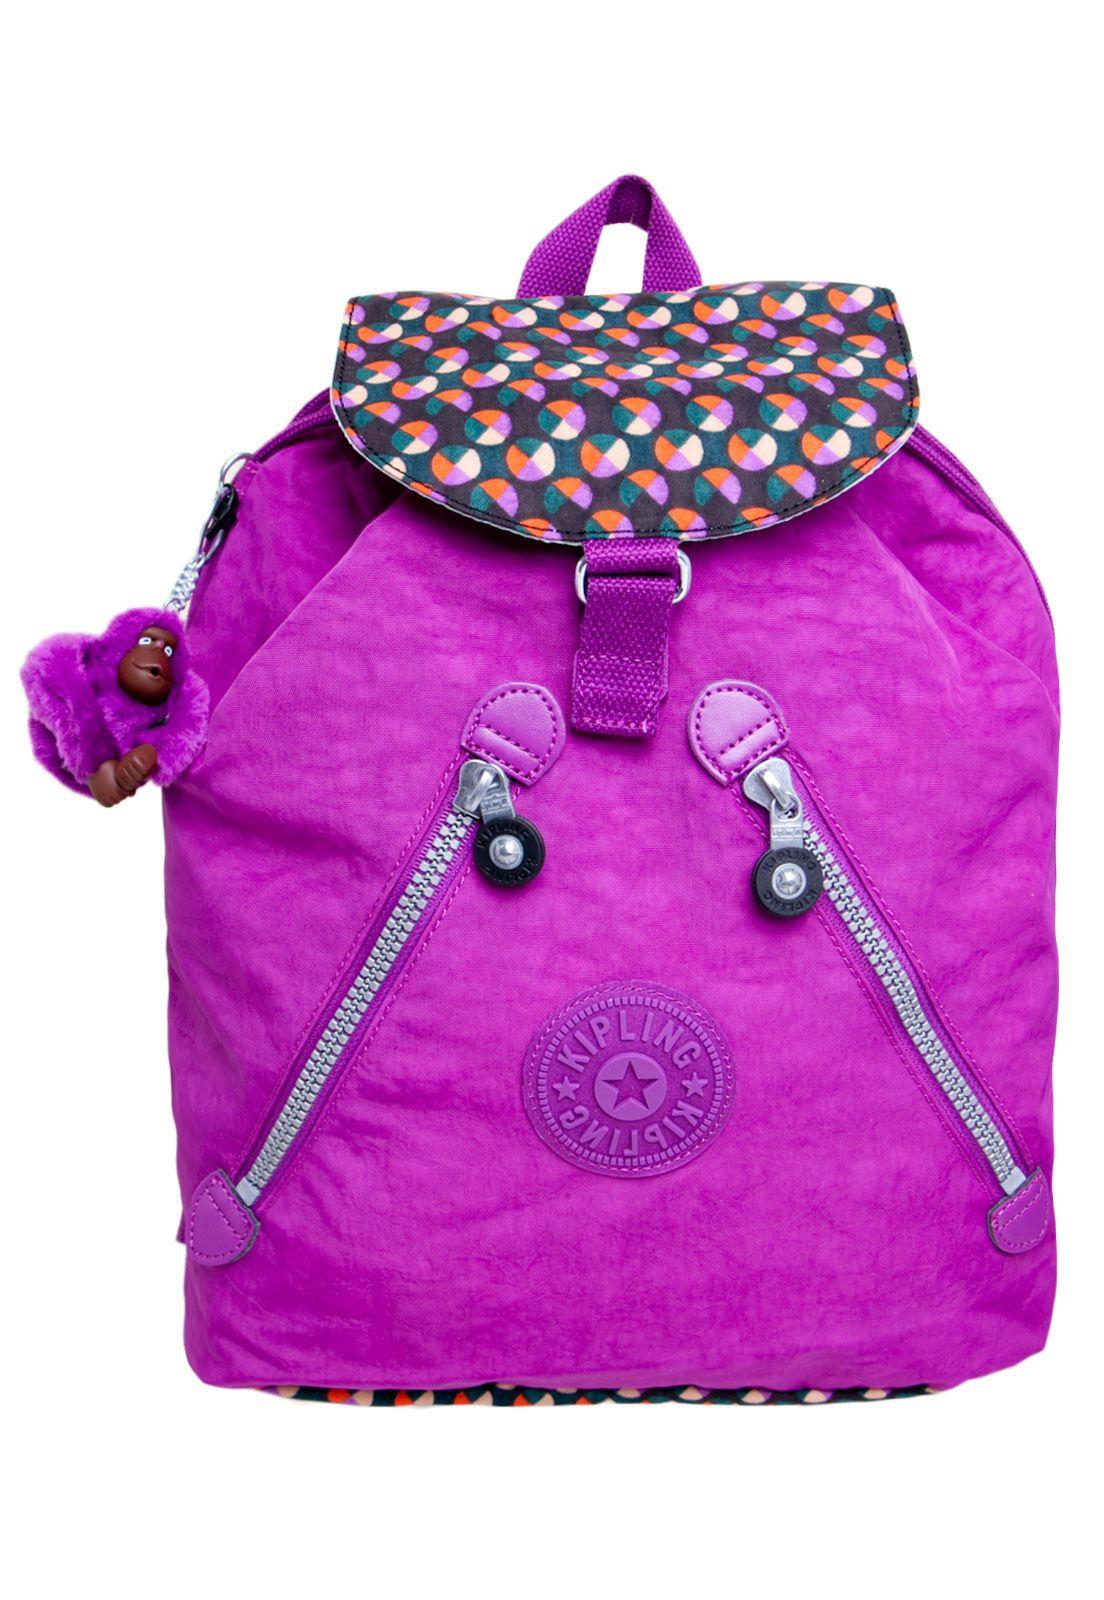 a864fb1f6 Mochila Kipling Roxa | Backpacks | Kipling bags, Backpacks, Bags